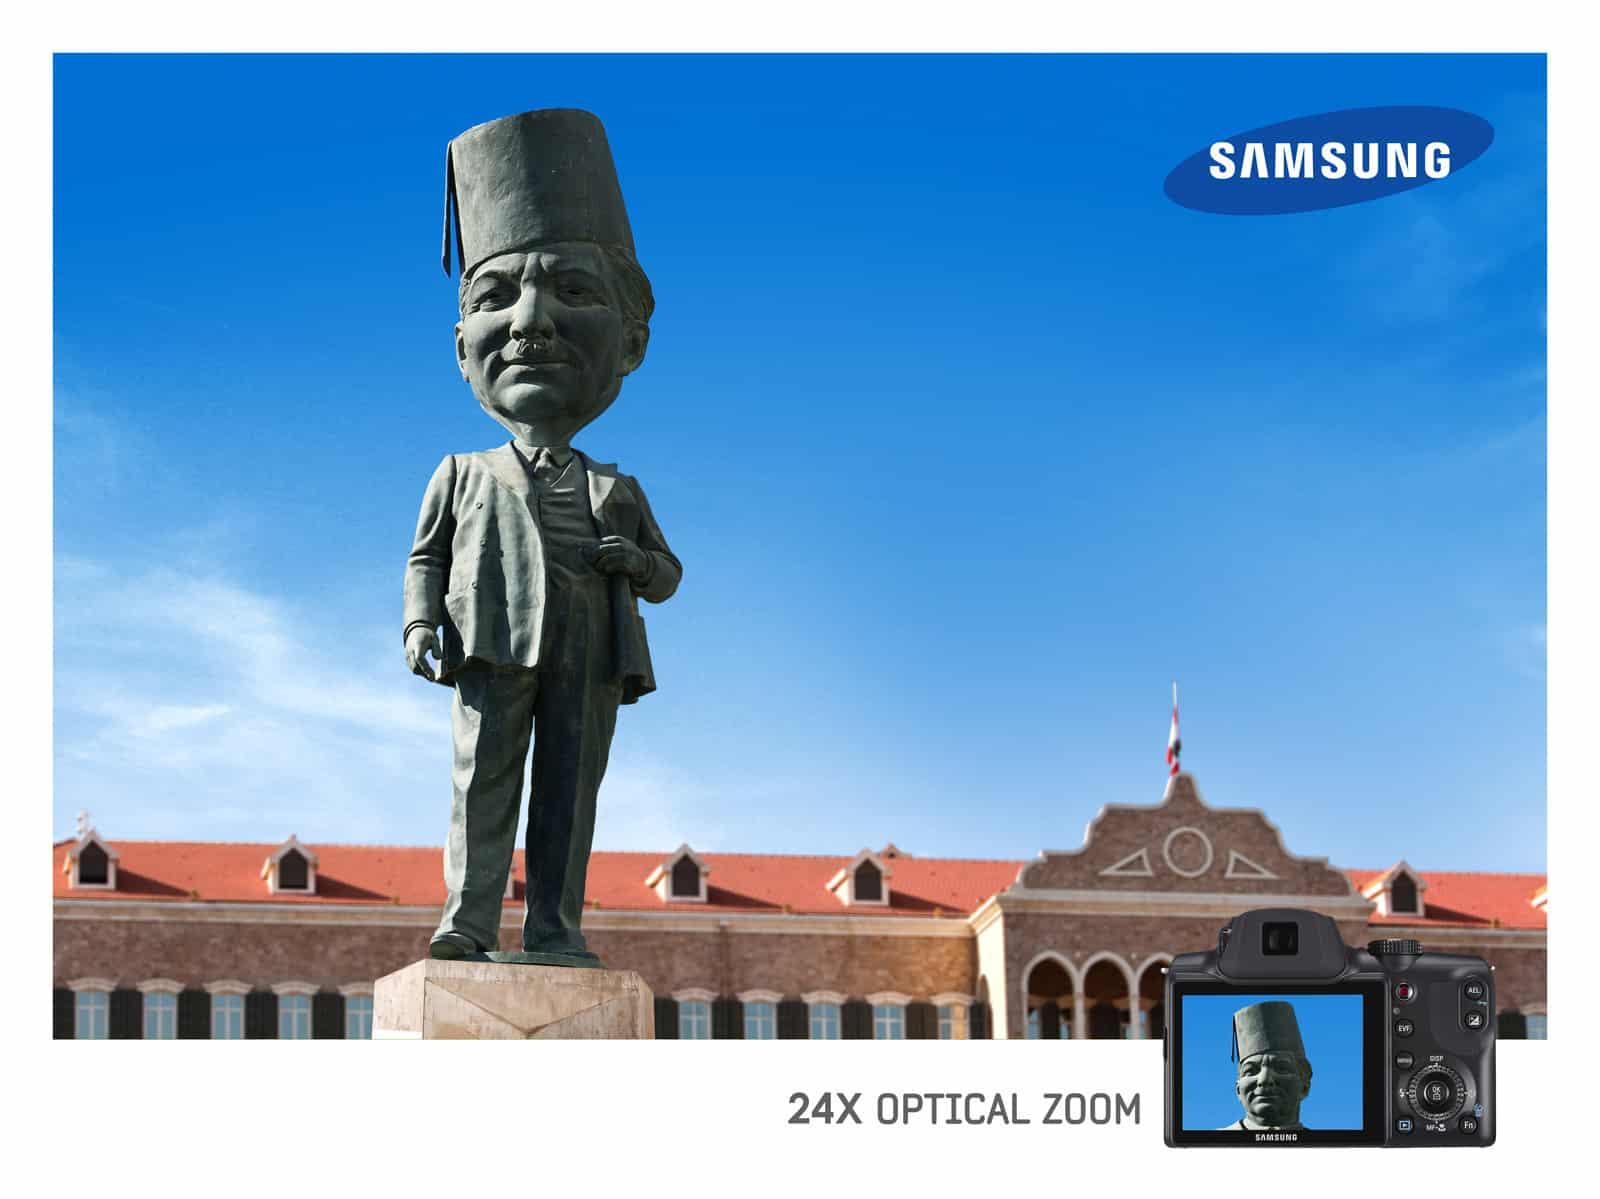 Samsung : Zoom optique 24x